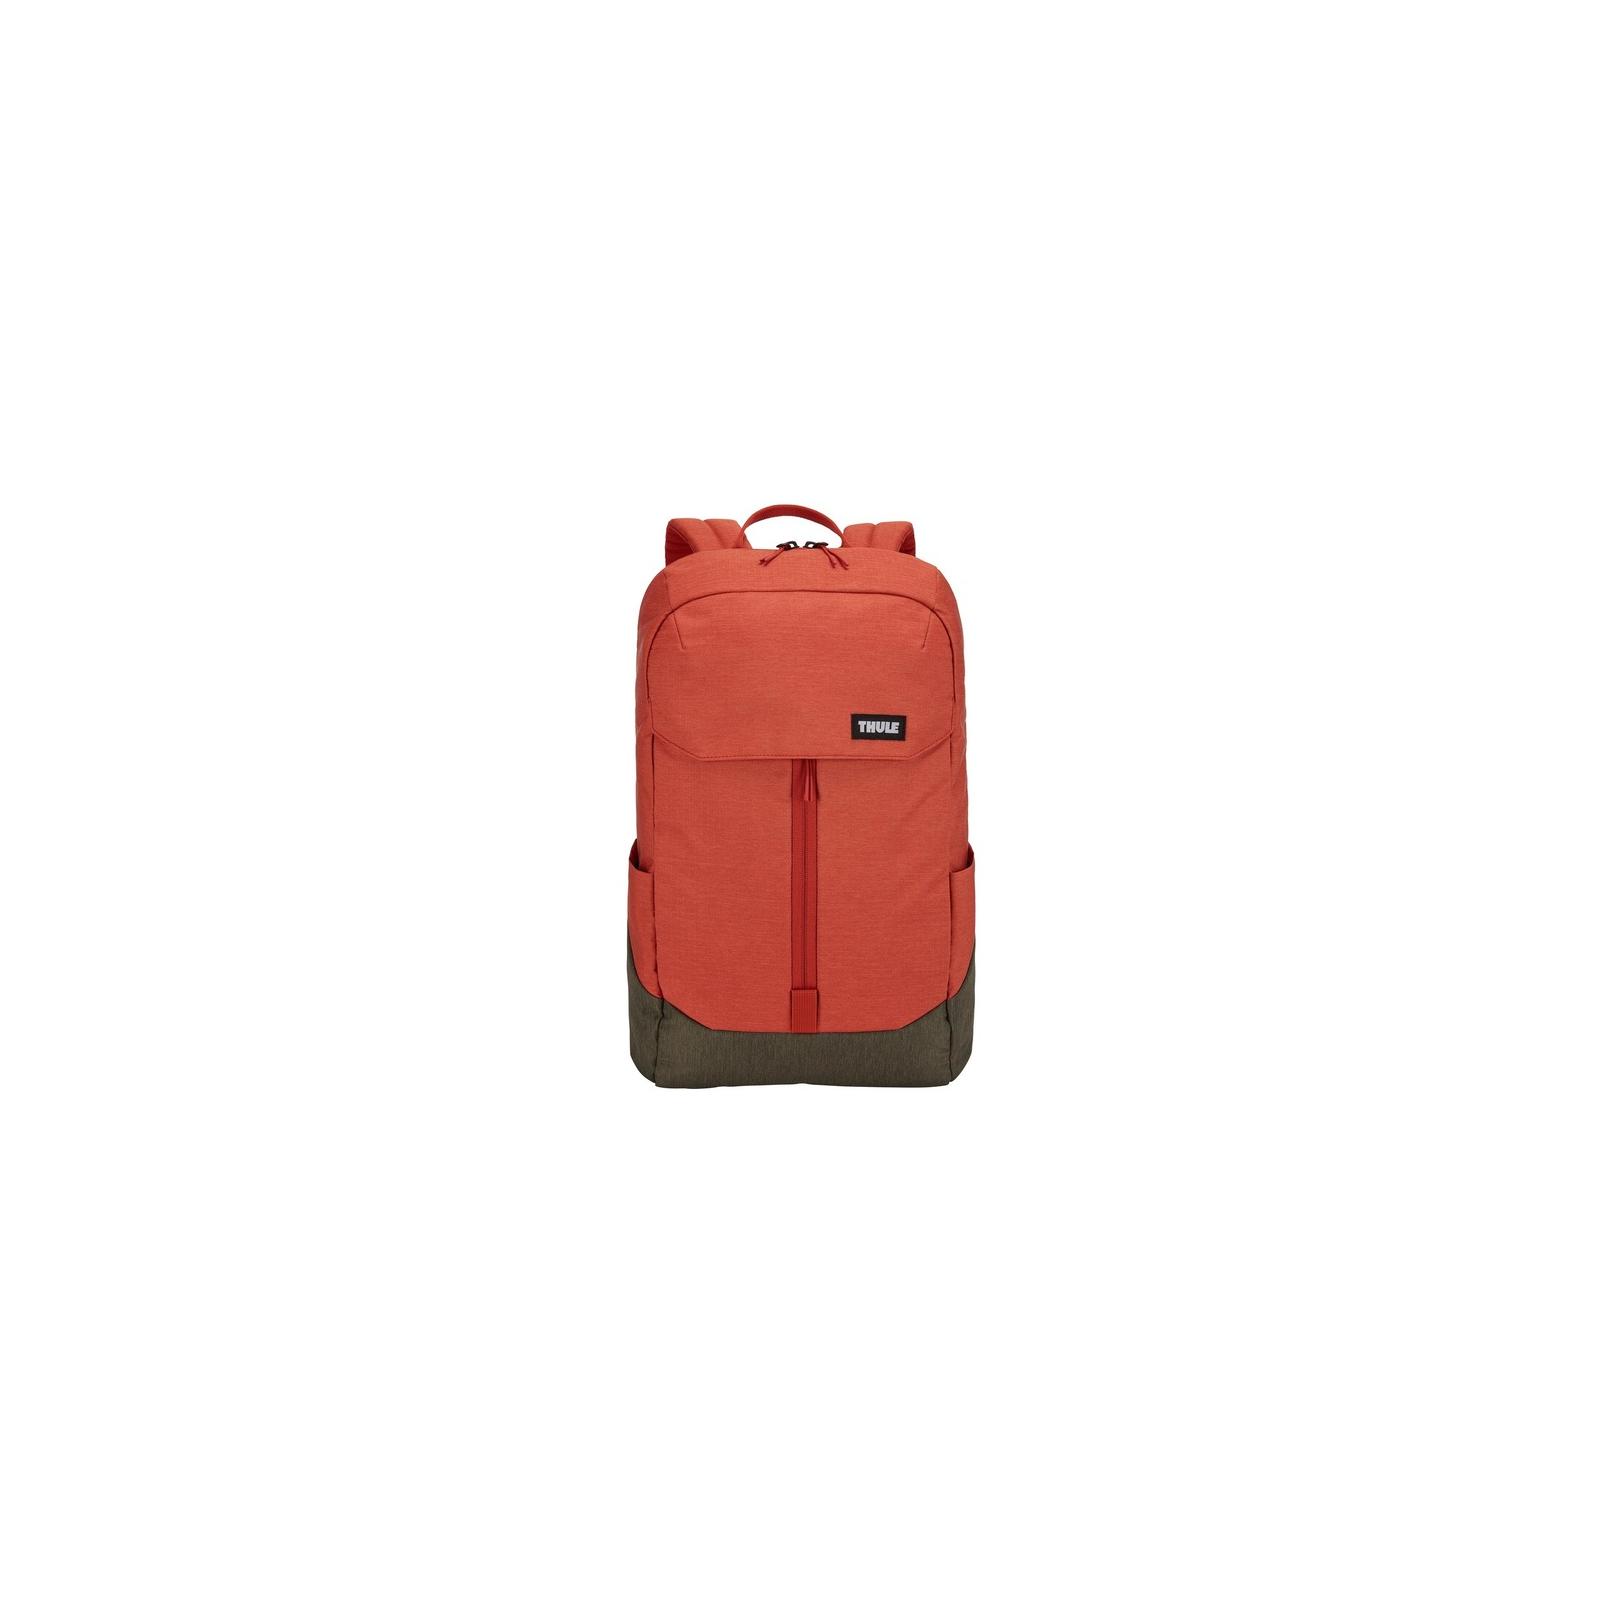 "Рюкзак для ноутбука Thule 15"" Lithos 20L Rooibos/Forest Night TLBP-116 (3203824) изображение 3"